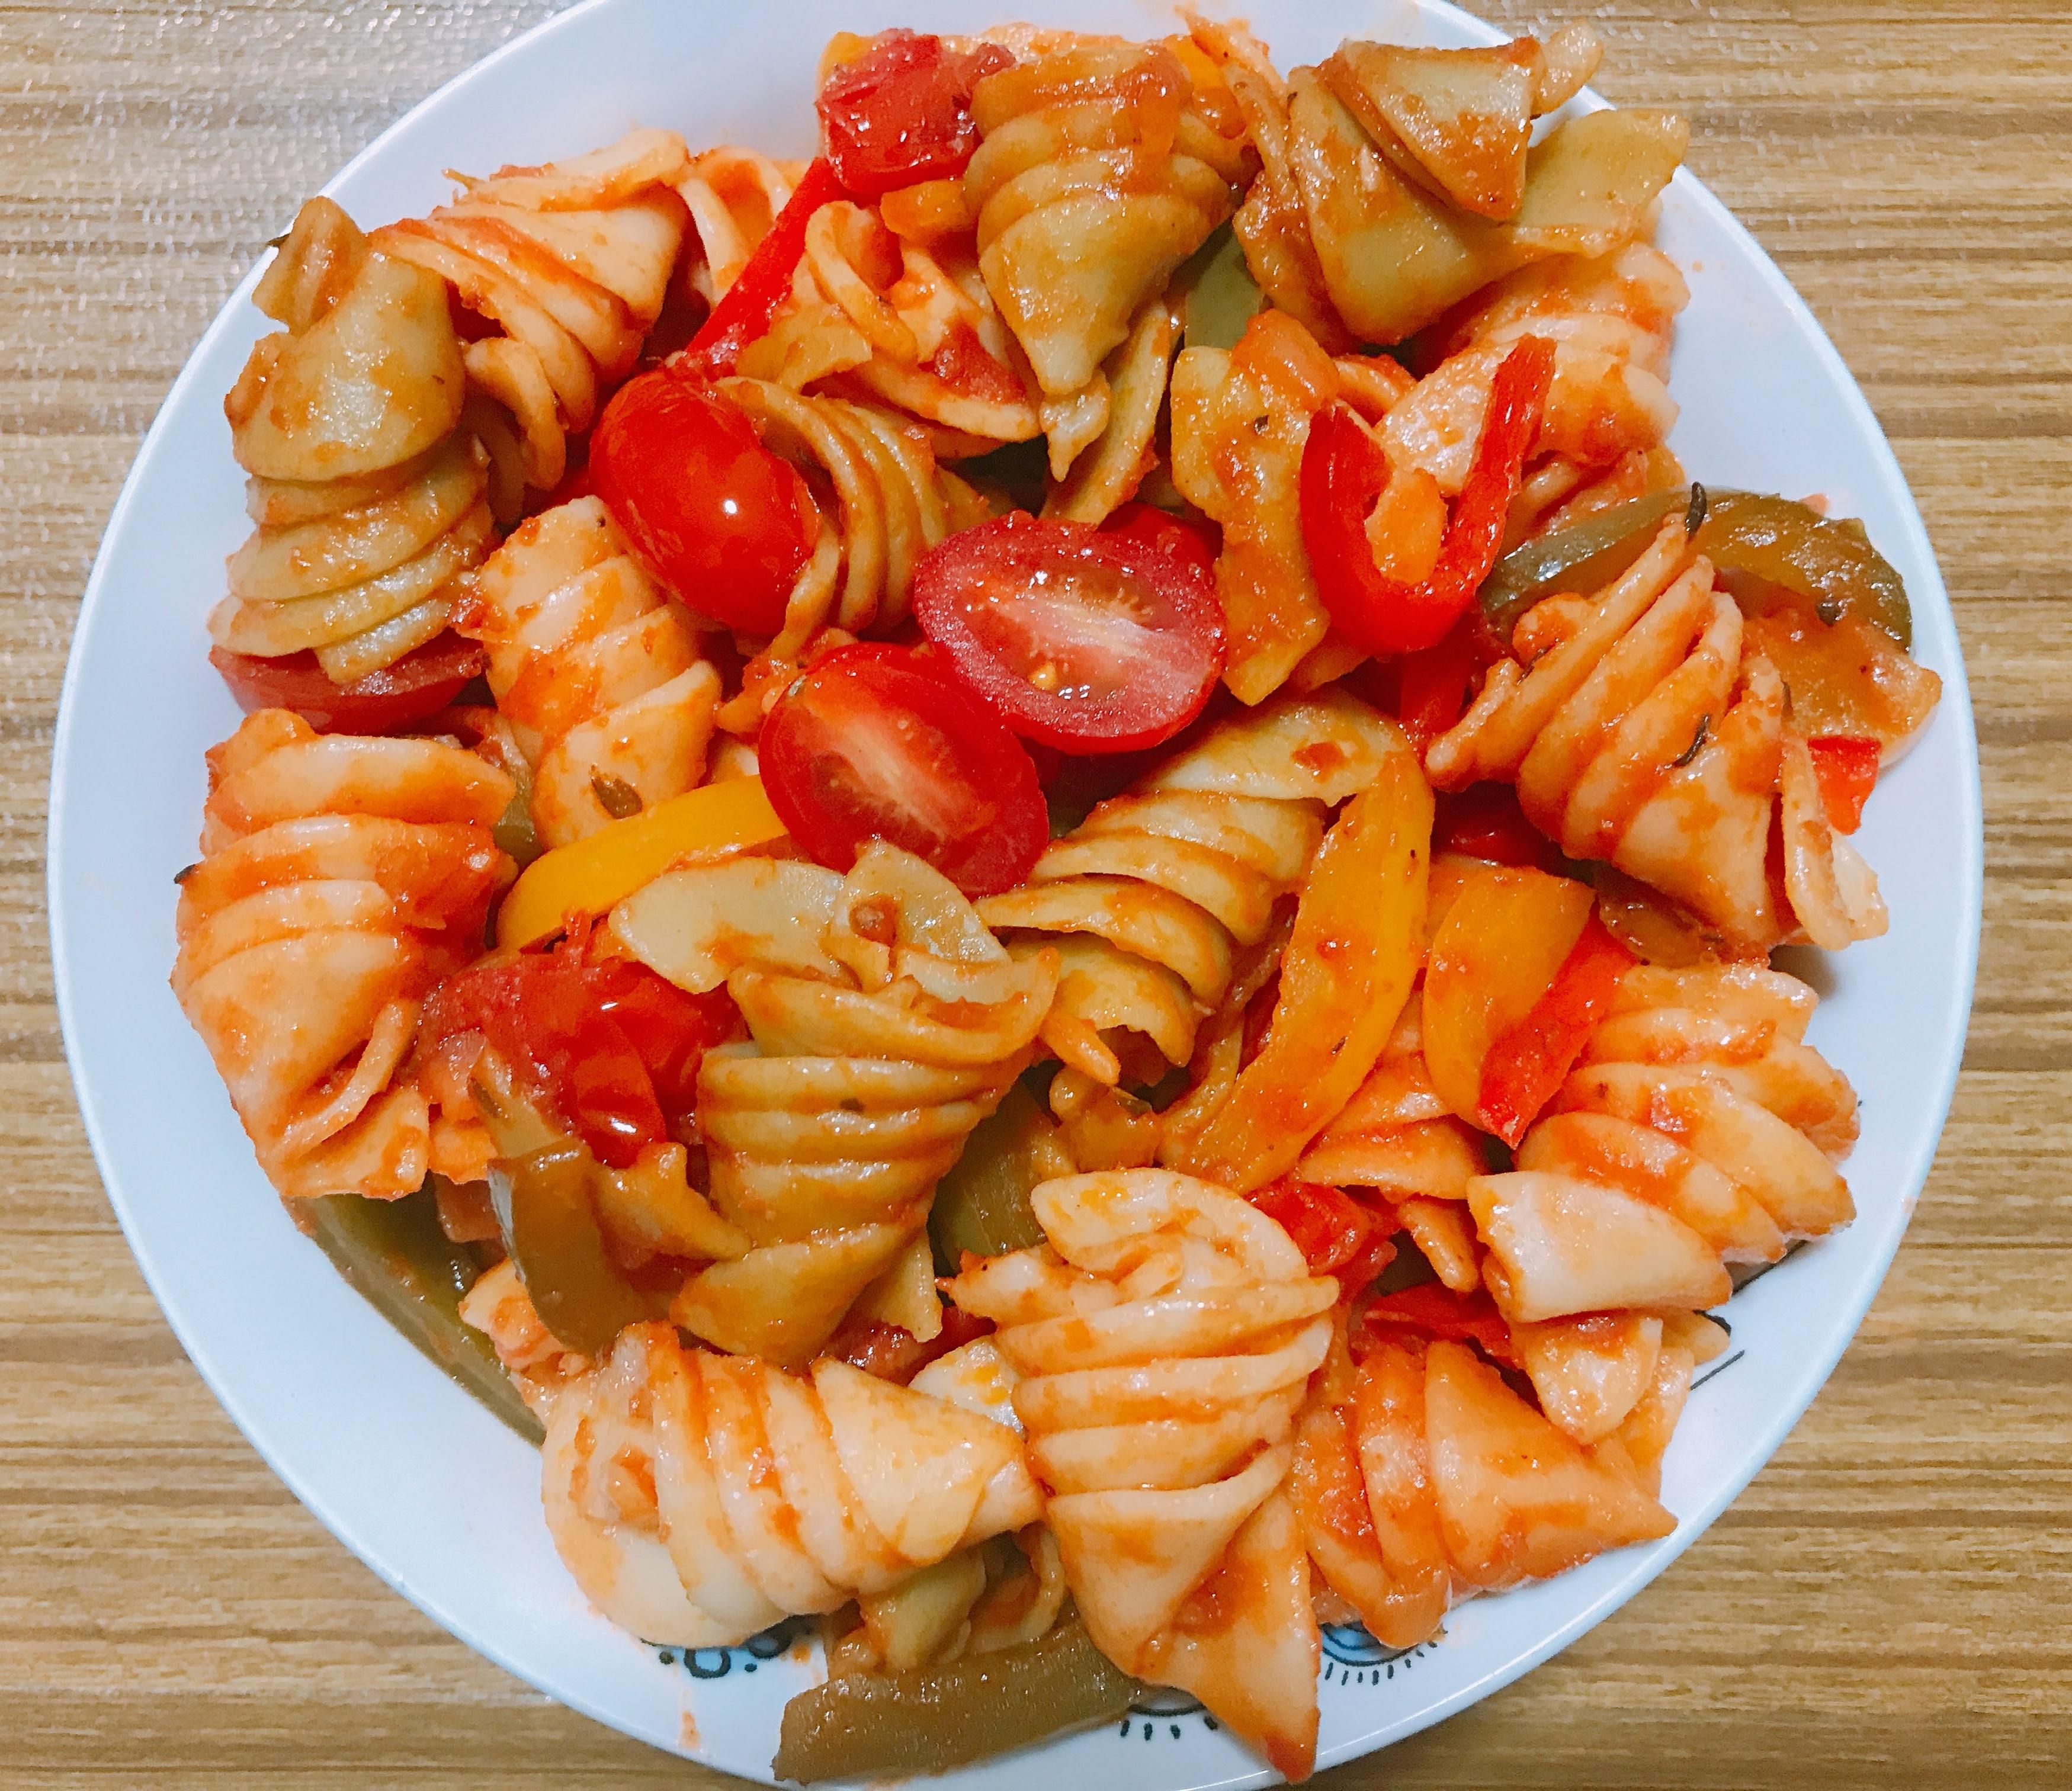 Red Sauce Tomato Basil Pasta